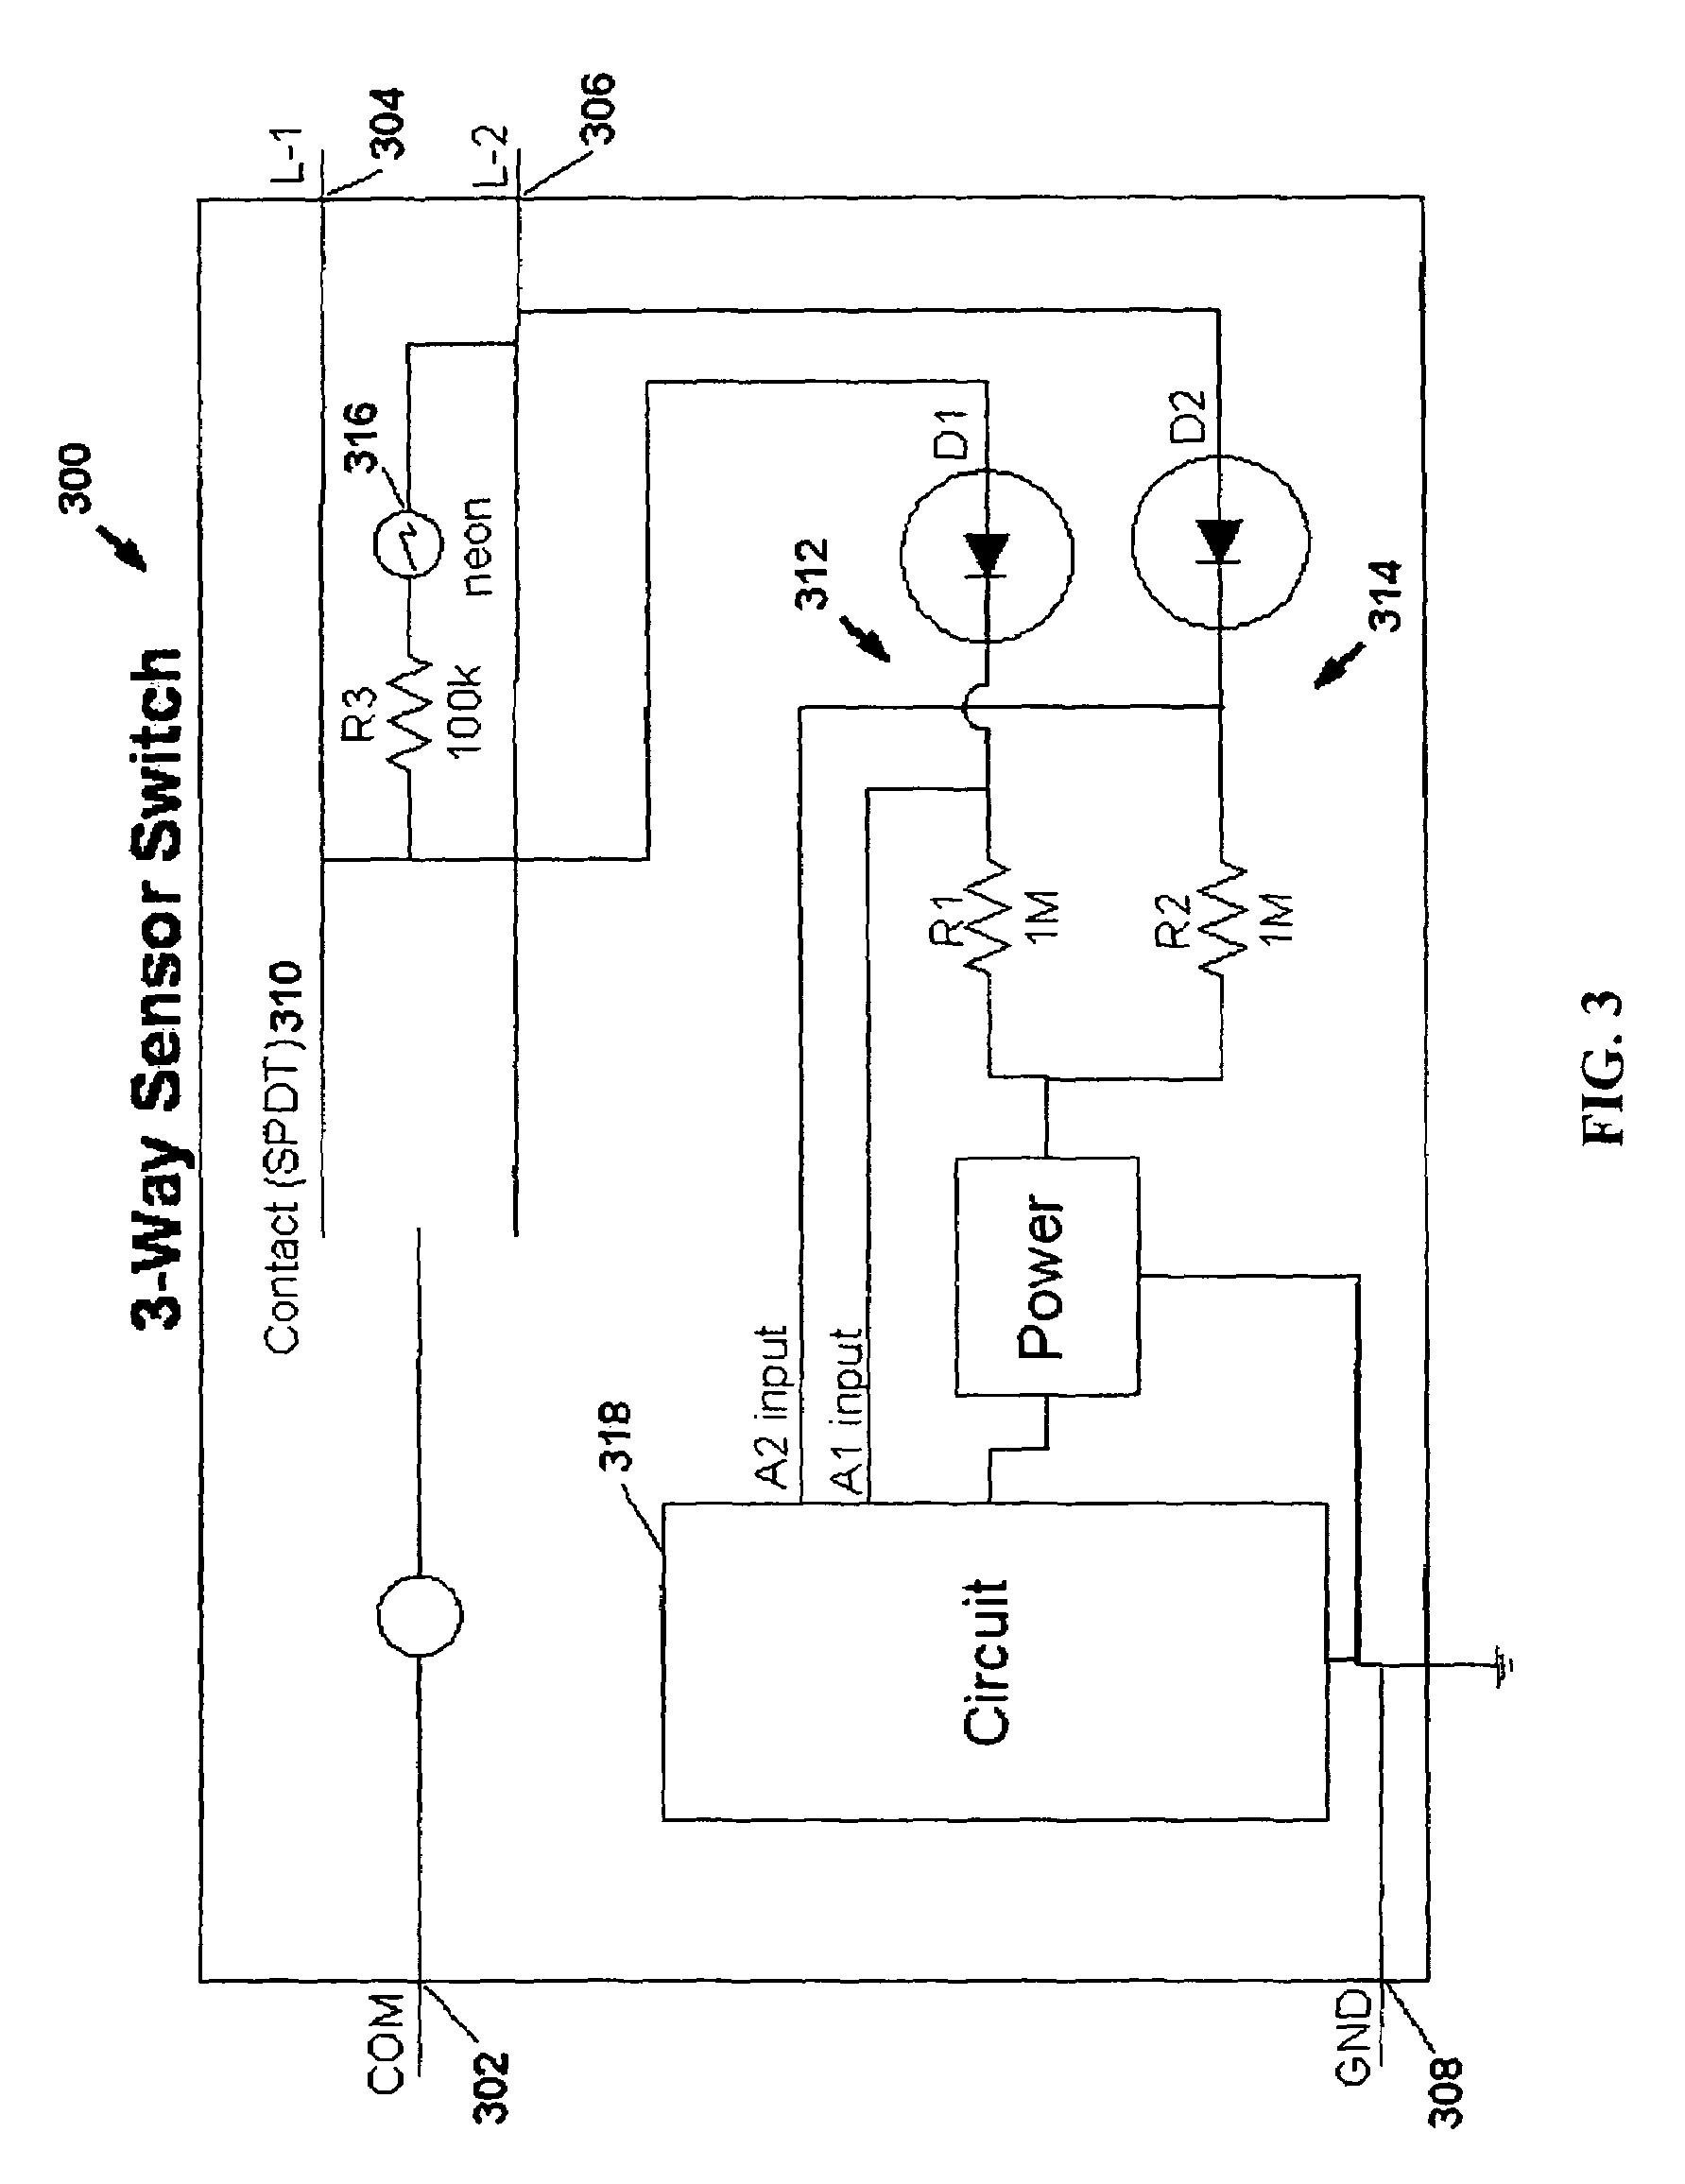 Motion Sensor Light Wiring Diagram Luxury Pir Motion Sensor Wiring